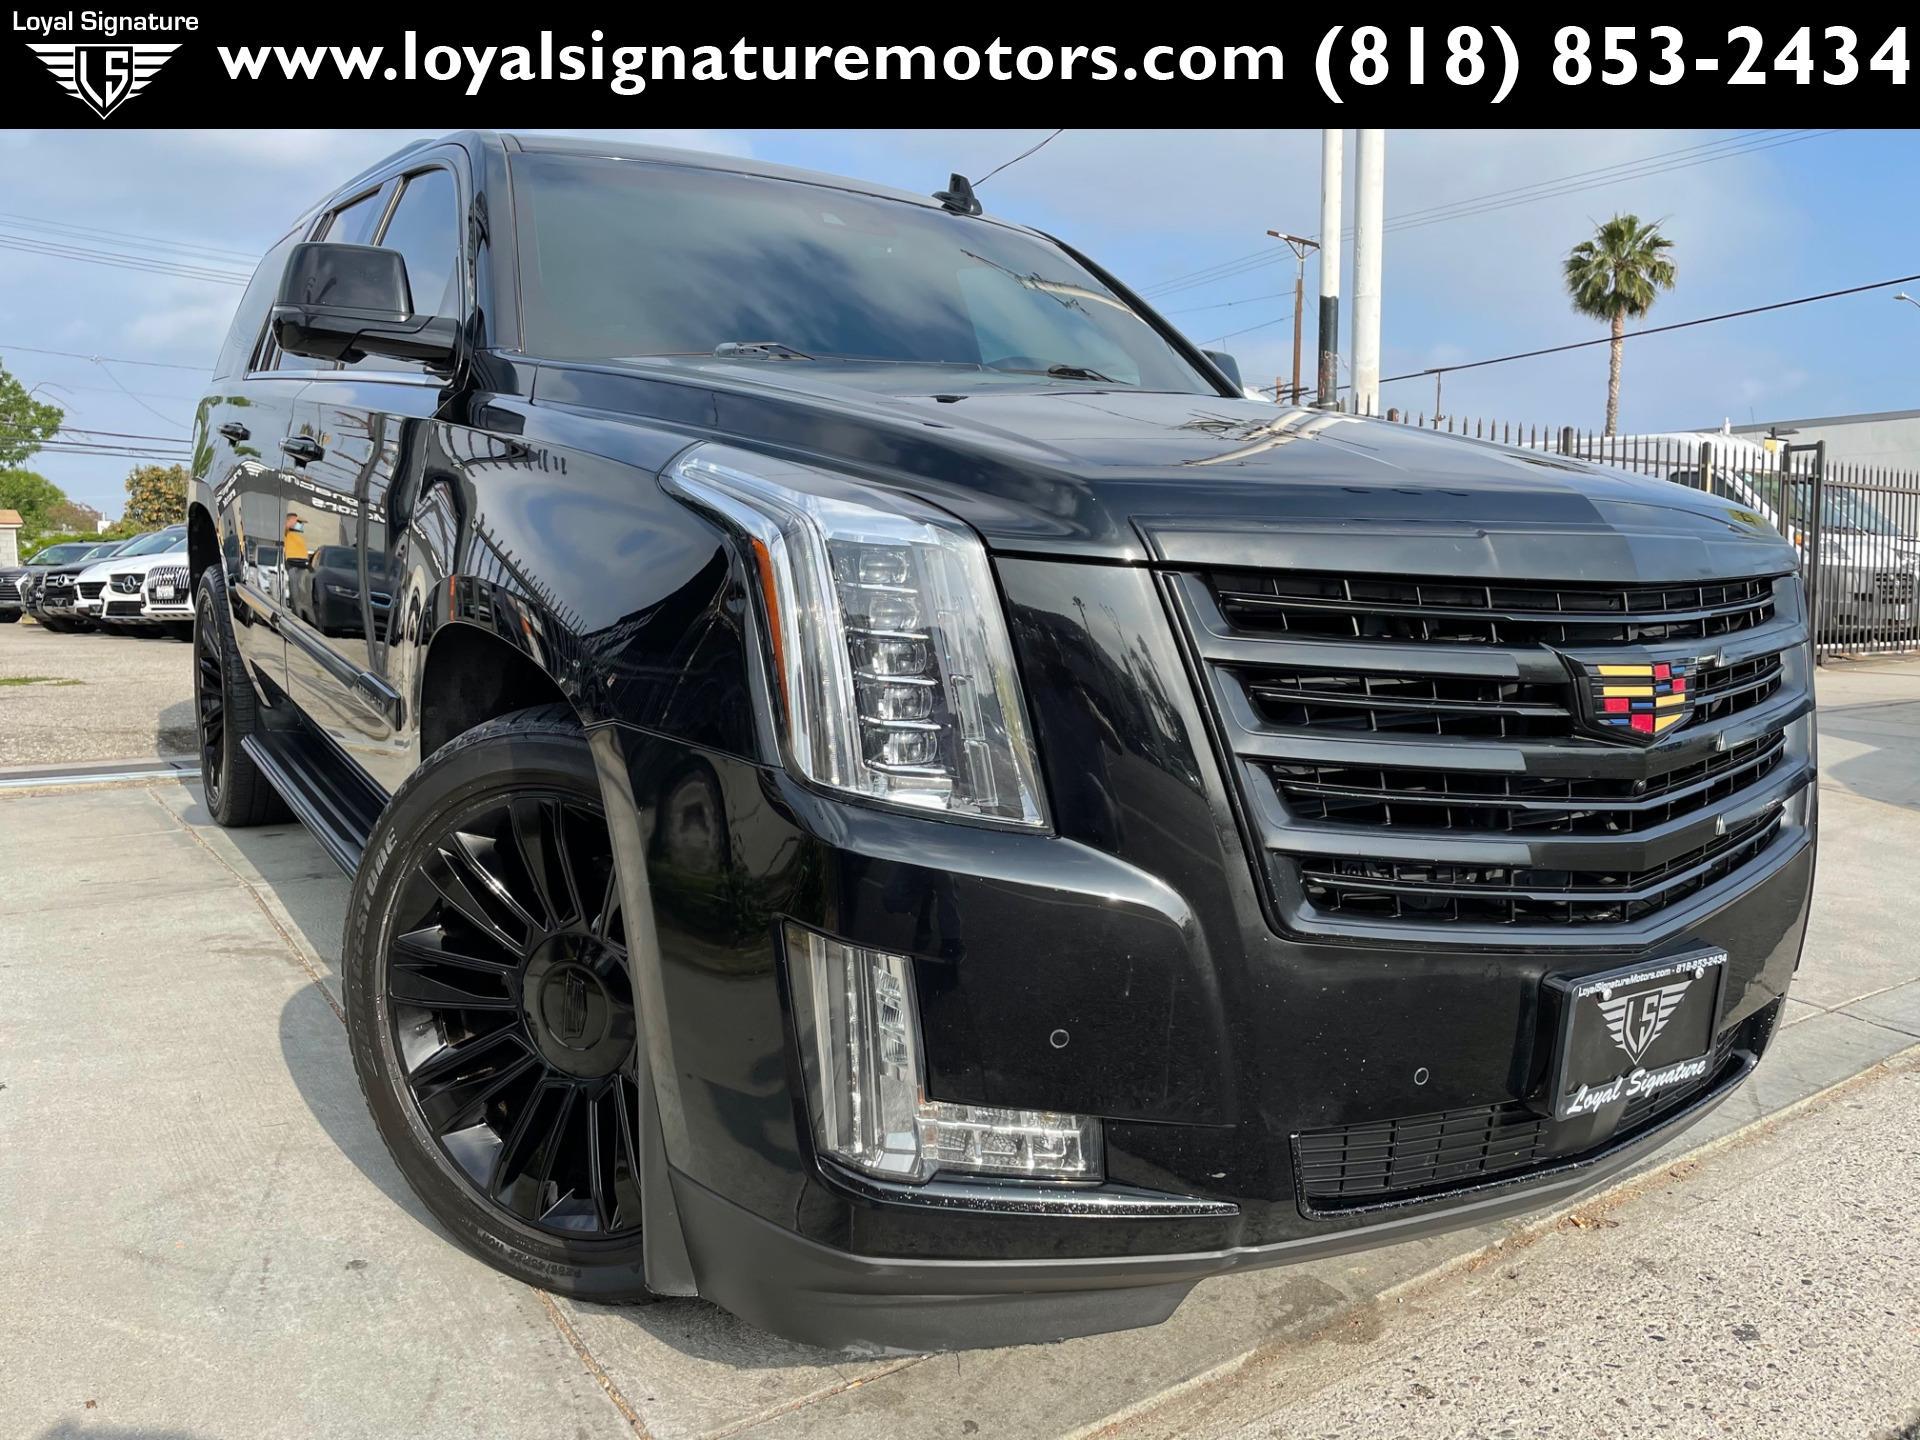 Used 2016 Cadillac Escalade Platinum   Van Nuys, CA